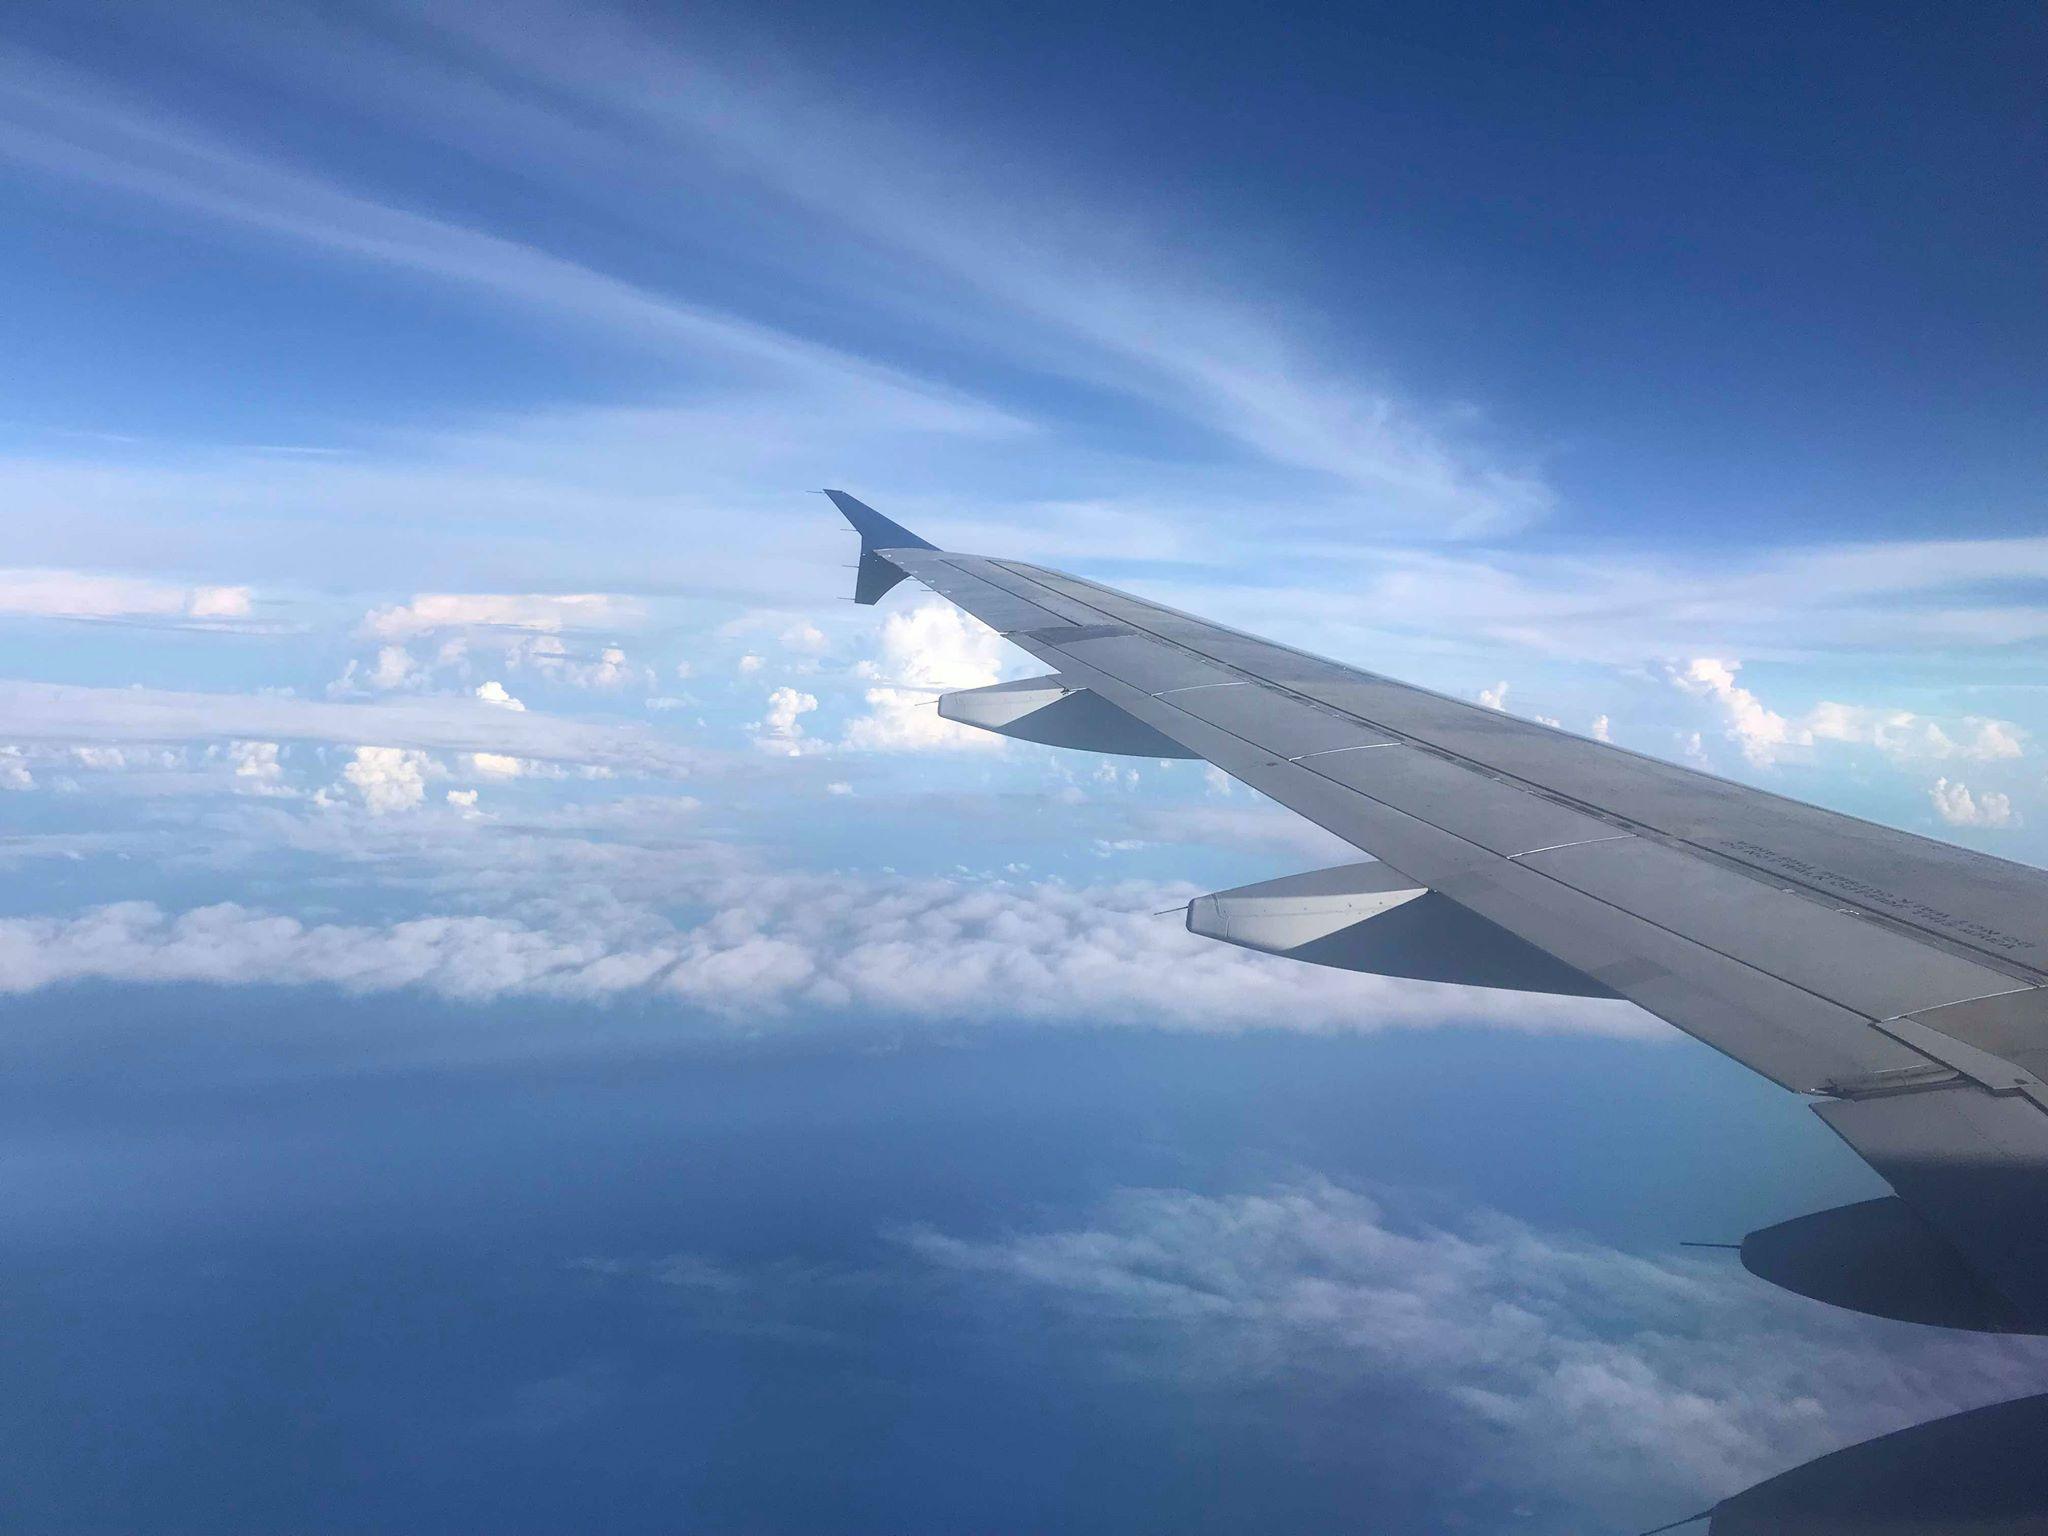 Briefly beautiful blue skies. -Richard Seidlitz